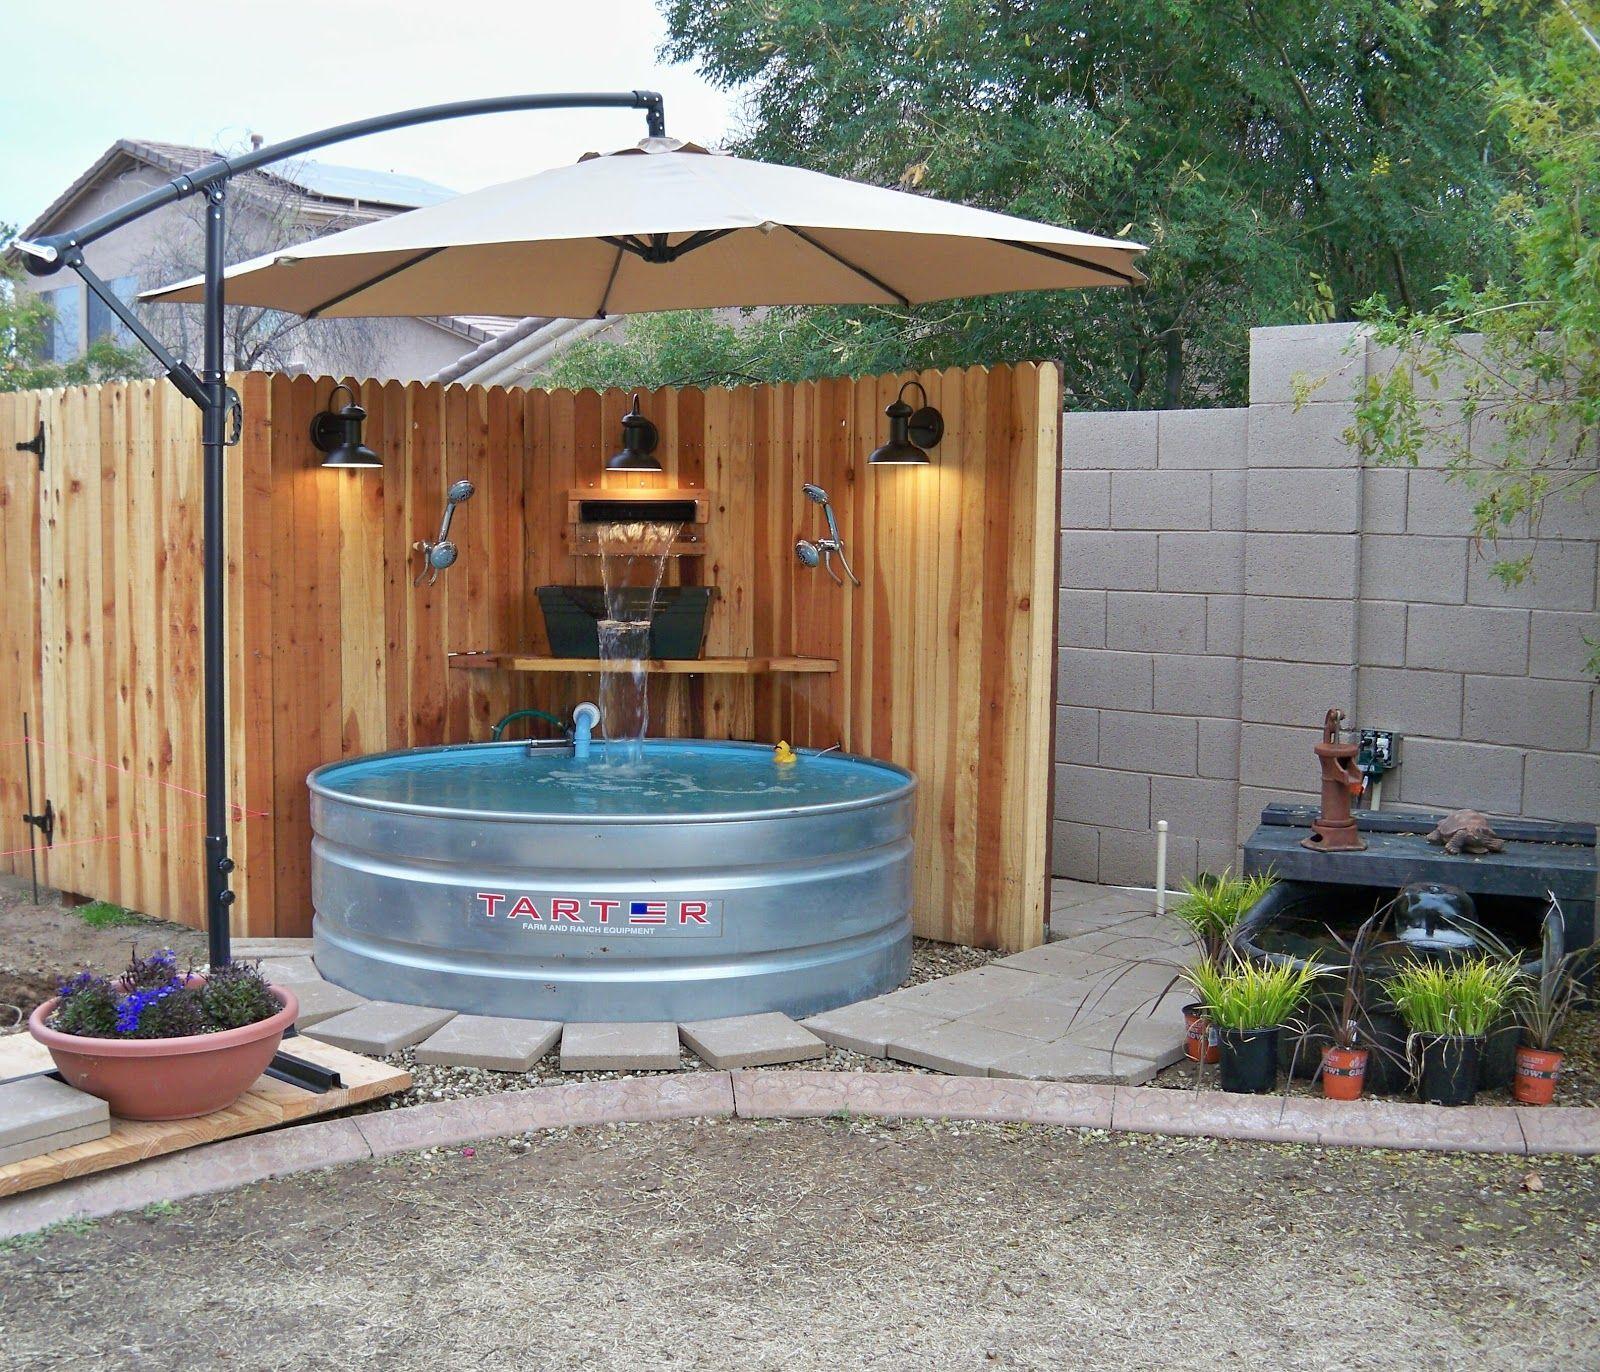 Backyard Progress - The Pool Is Finished